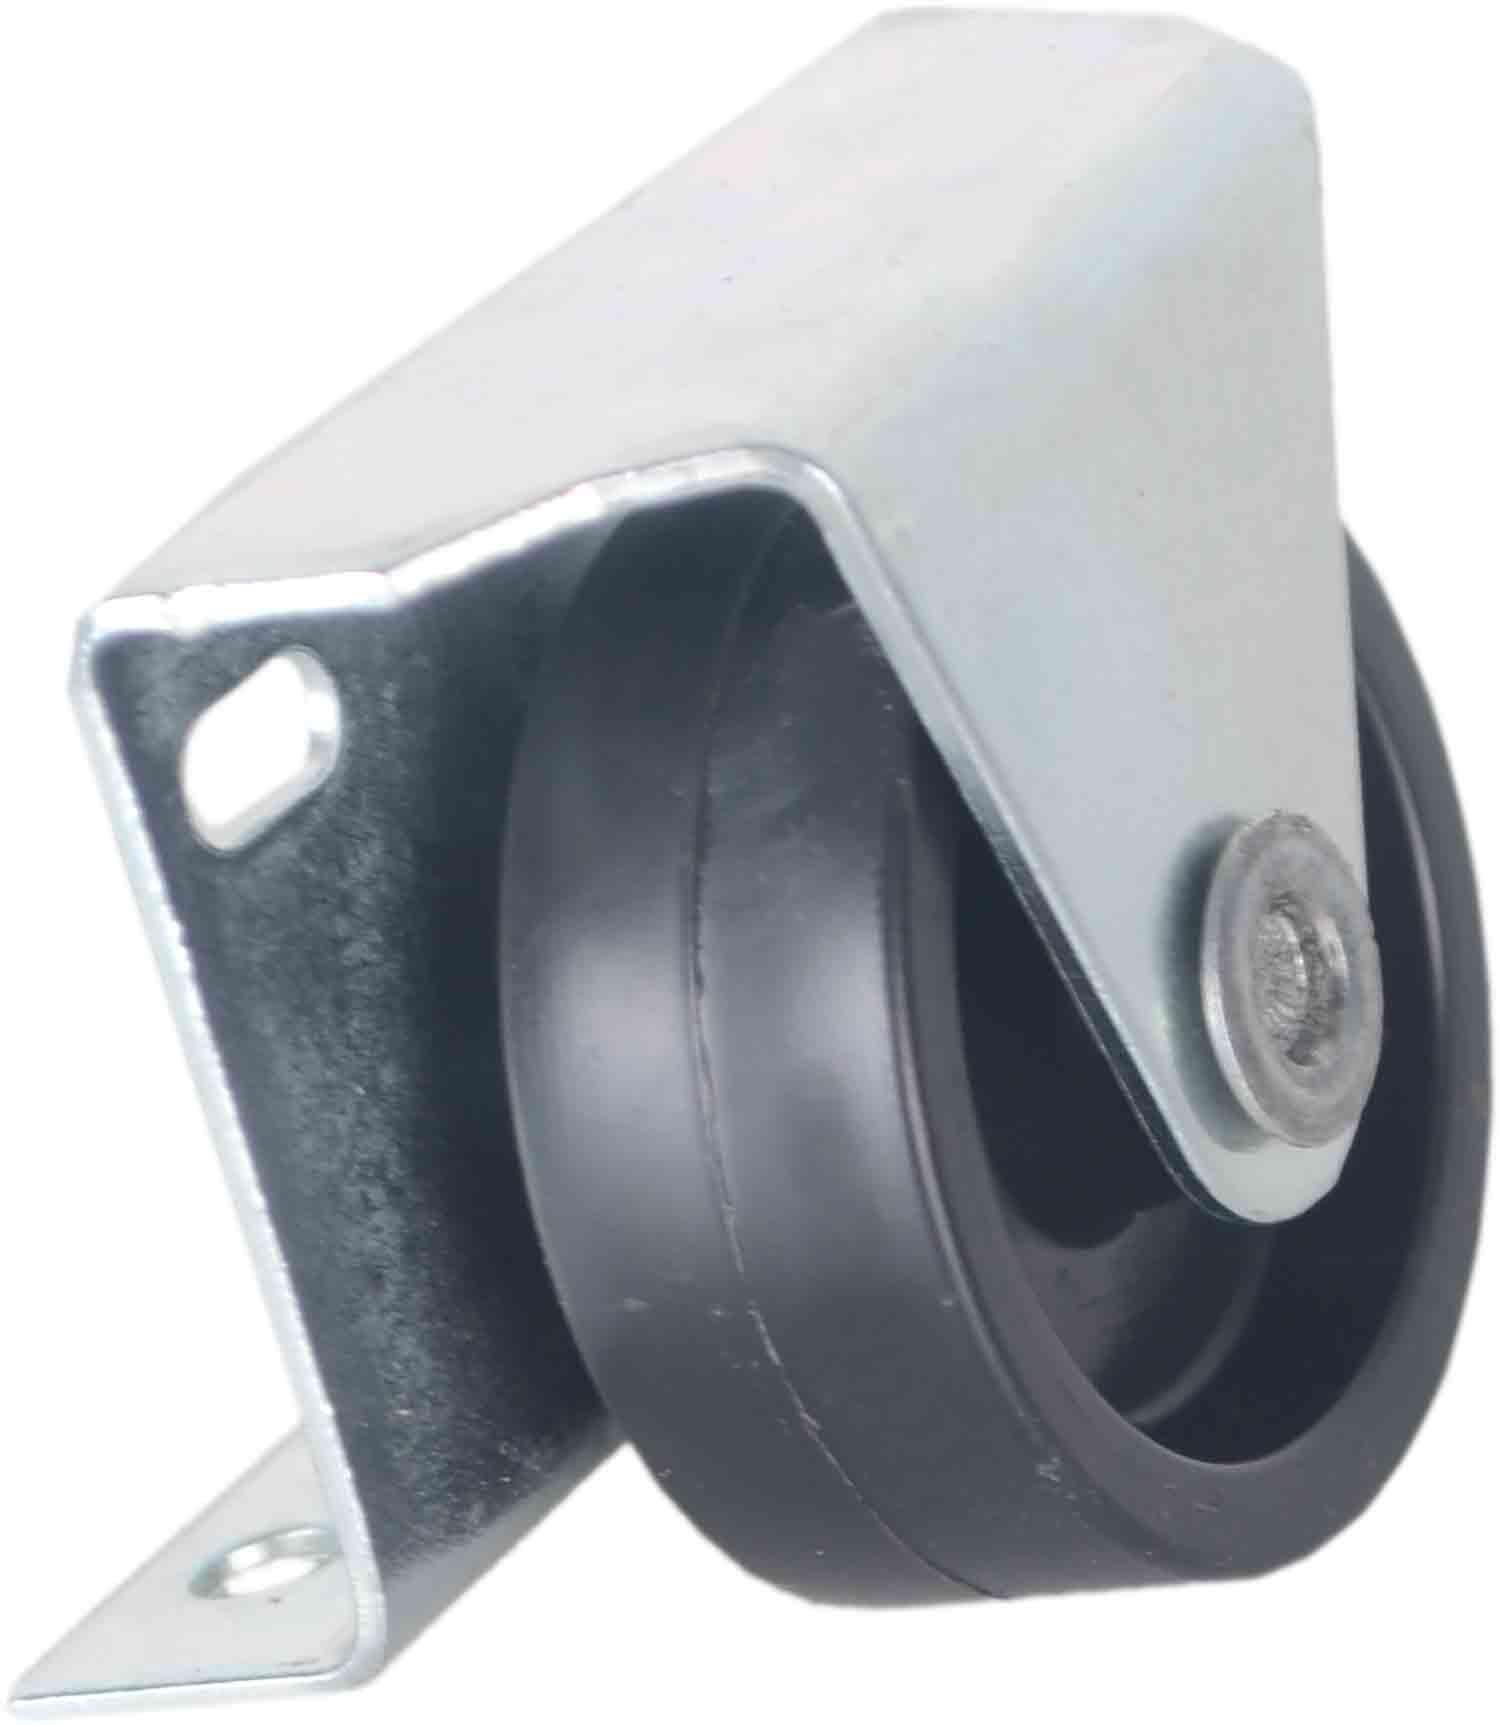 Roda Rodízio Fixo Chapa L 36mm 50kg (Cama auxiliar)